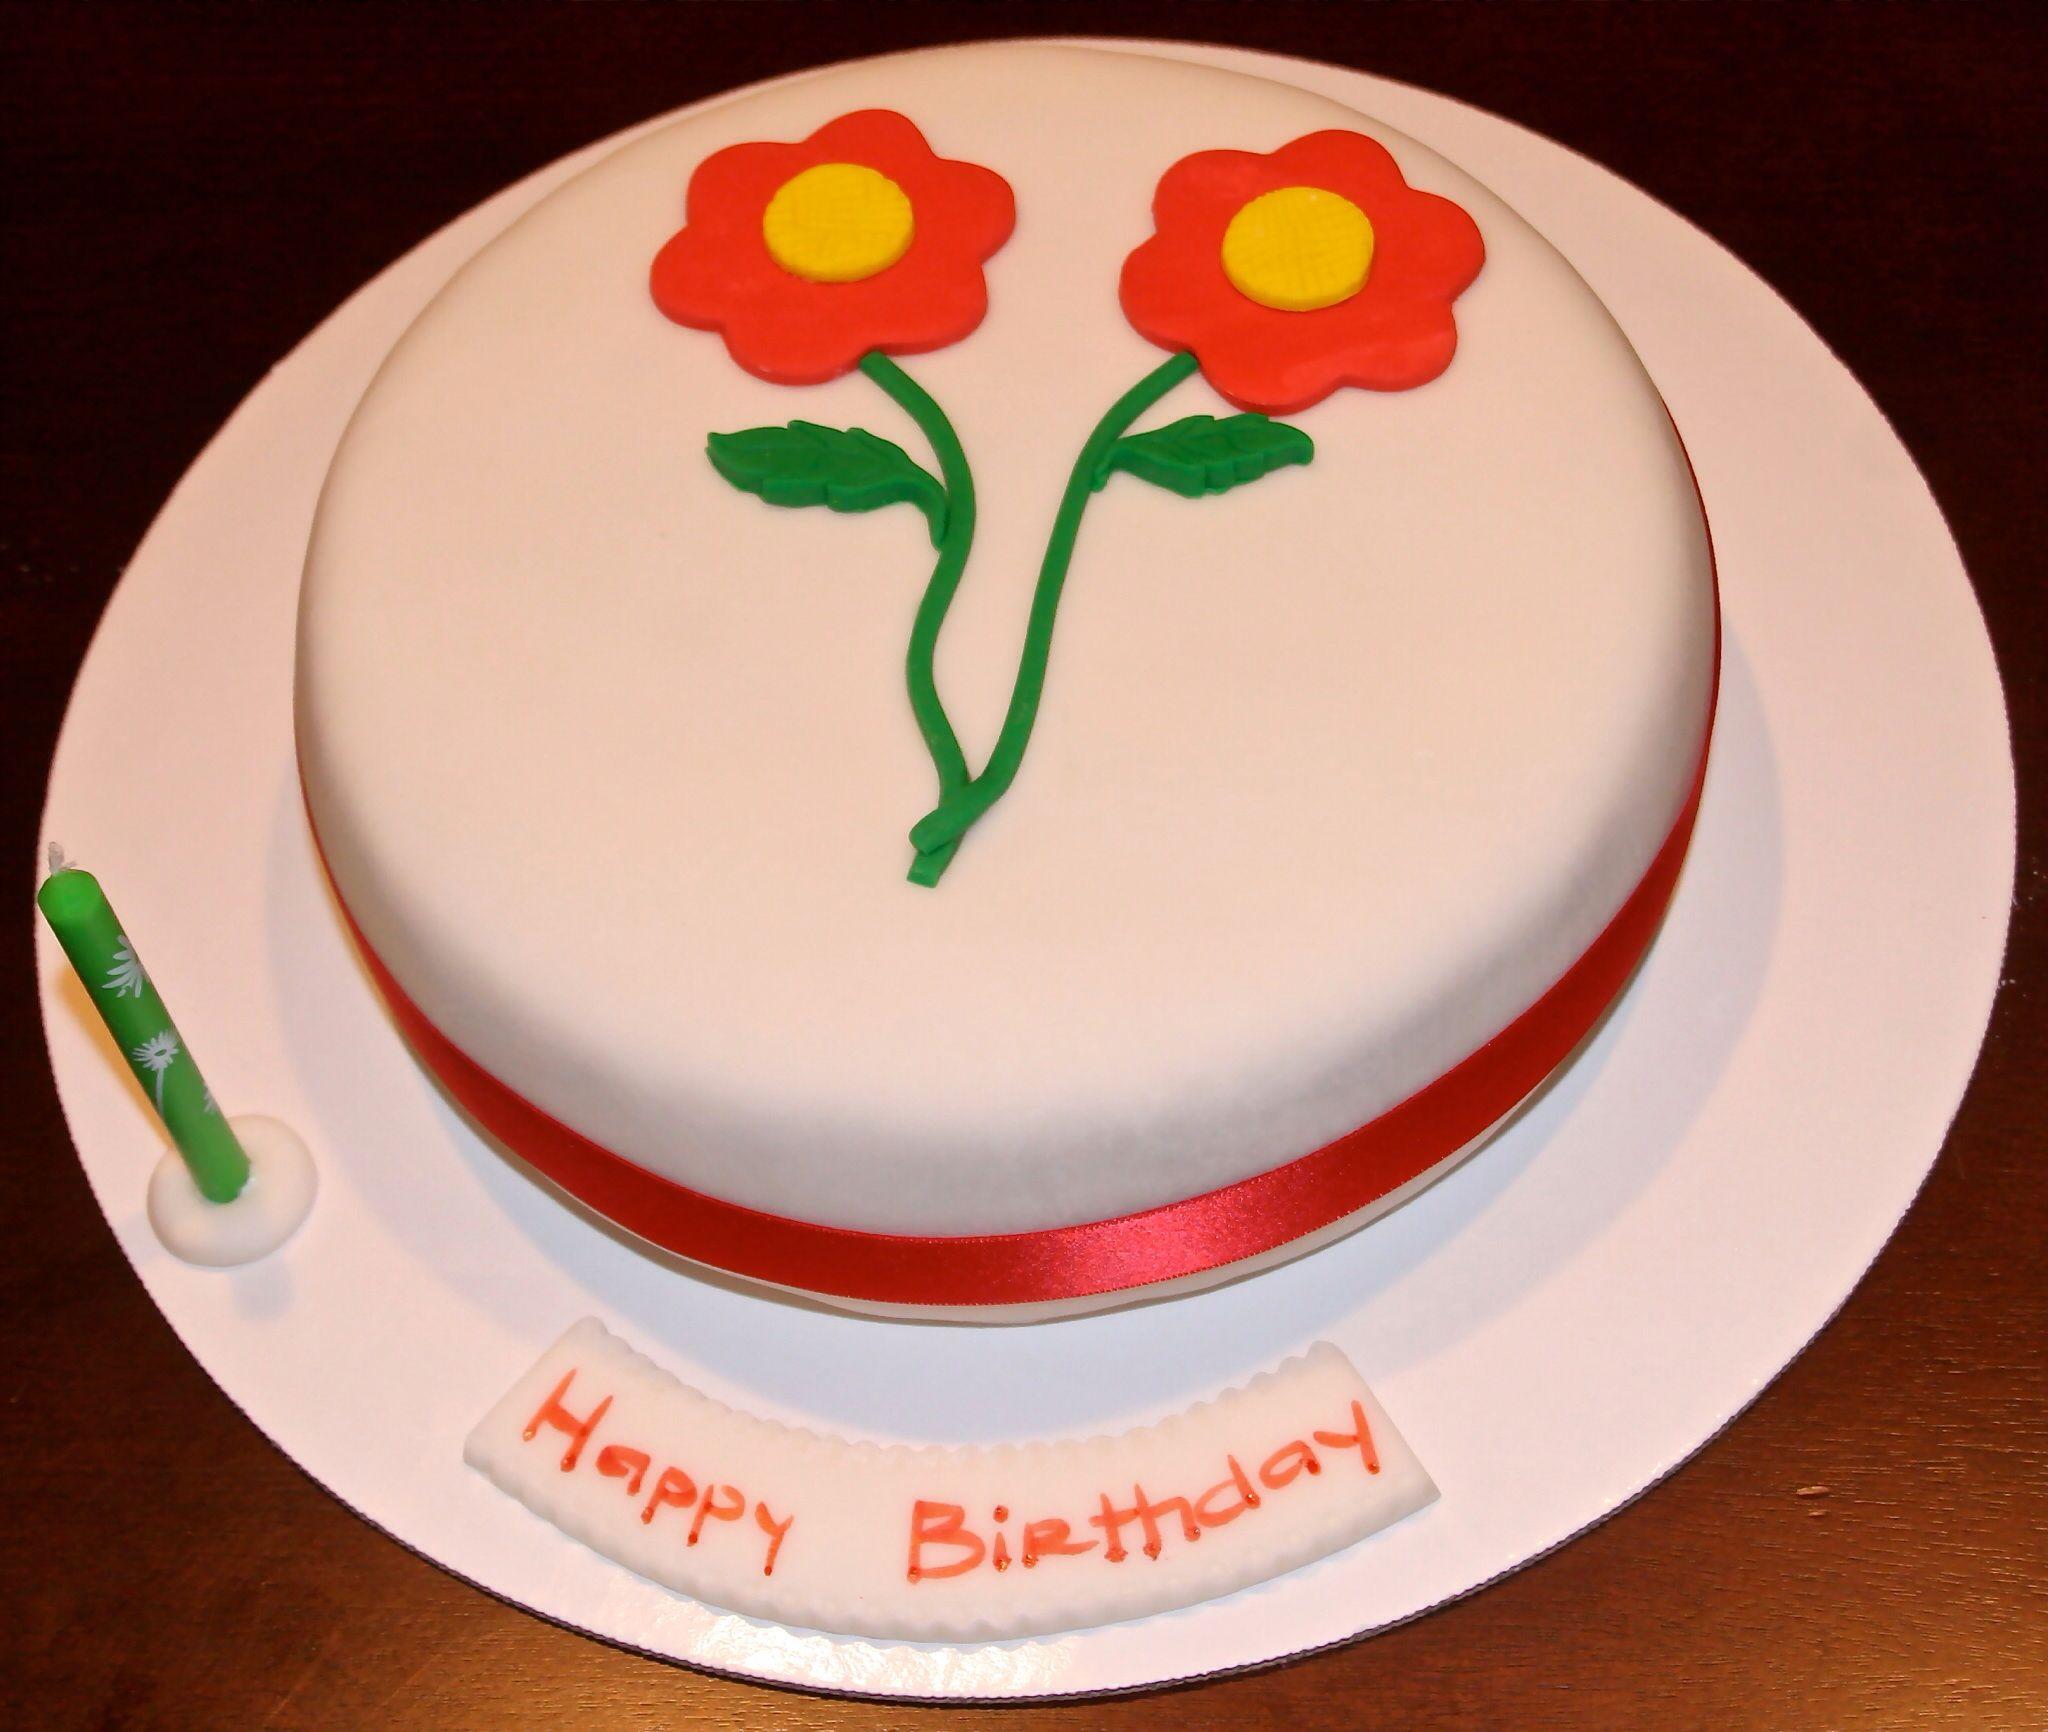 Simple Fondant Cake Cake Decorating Ideas Pinterest